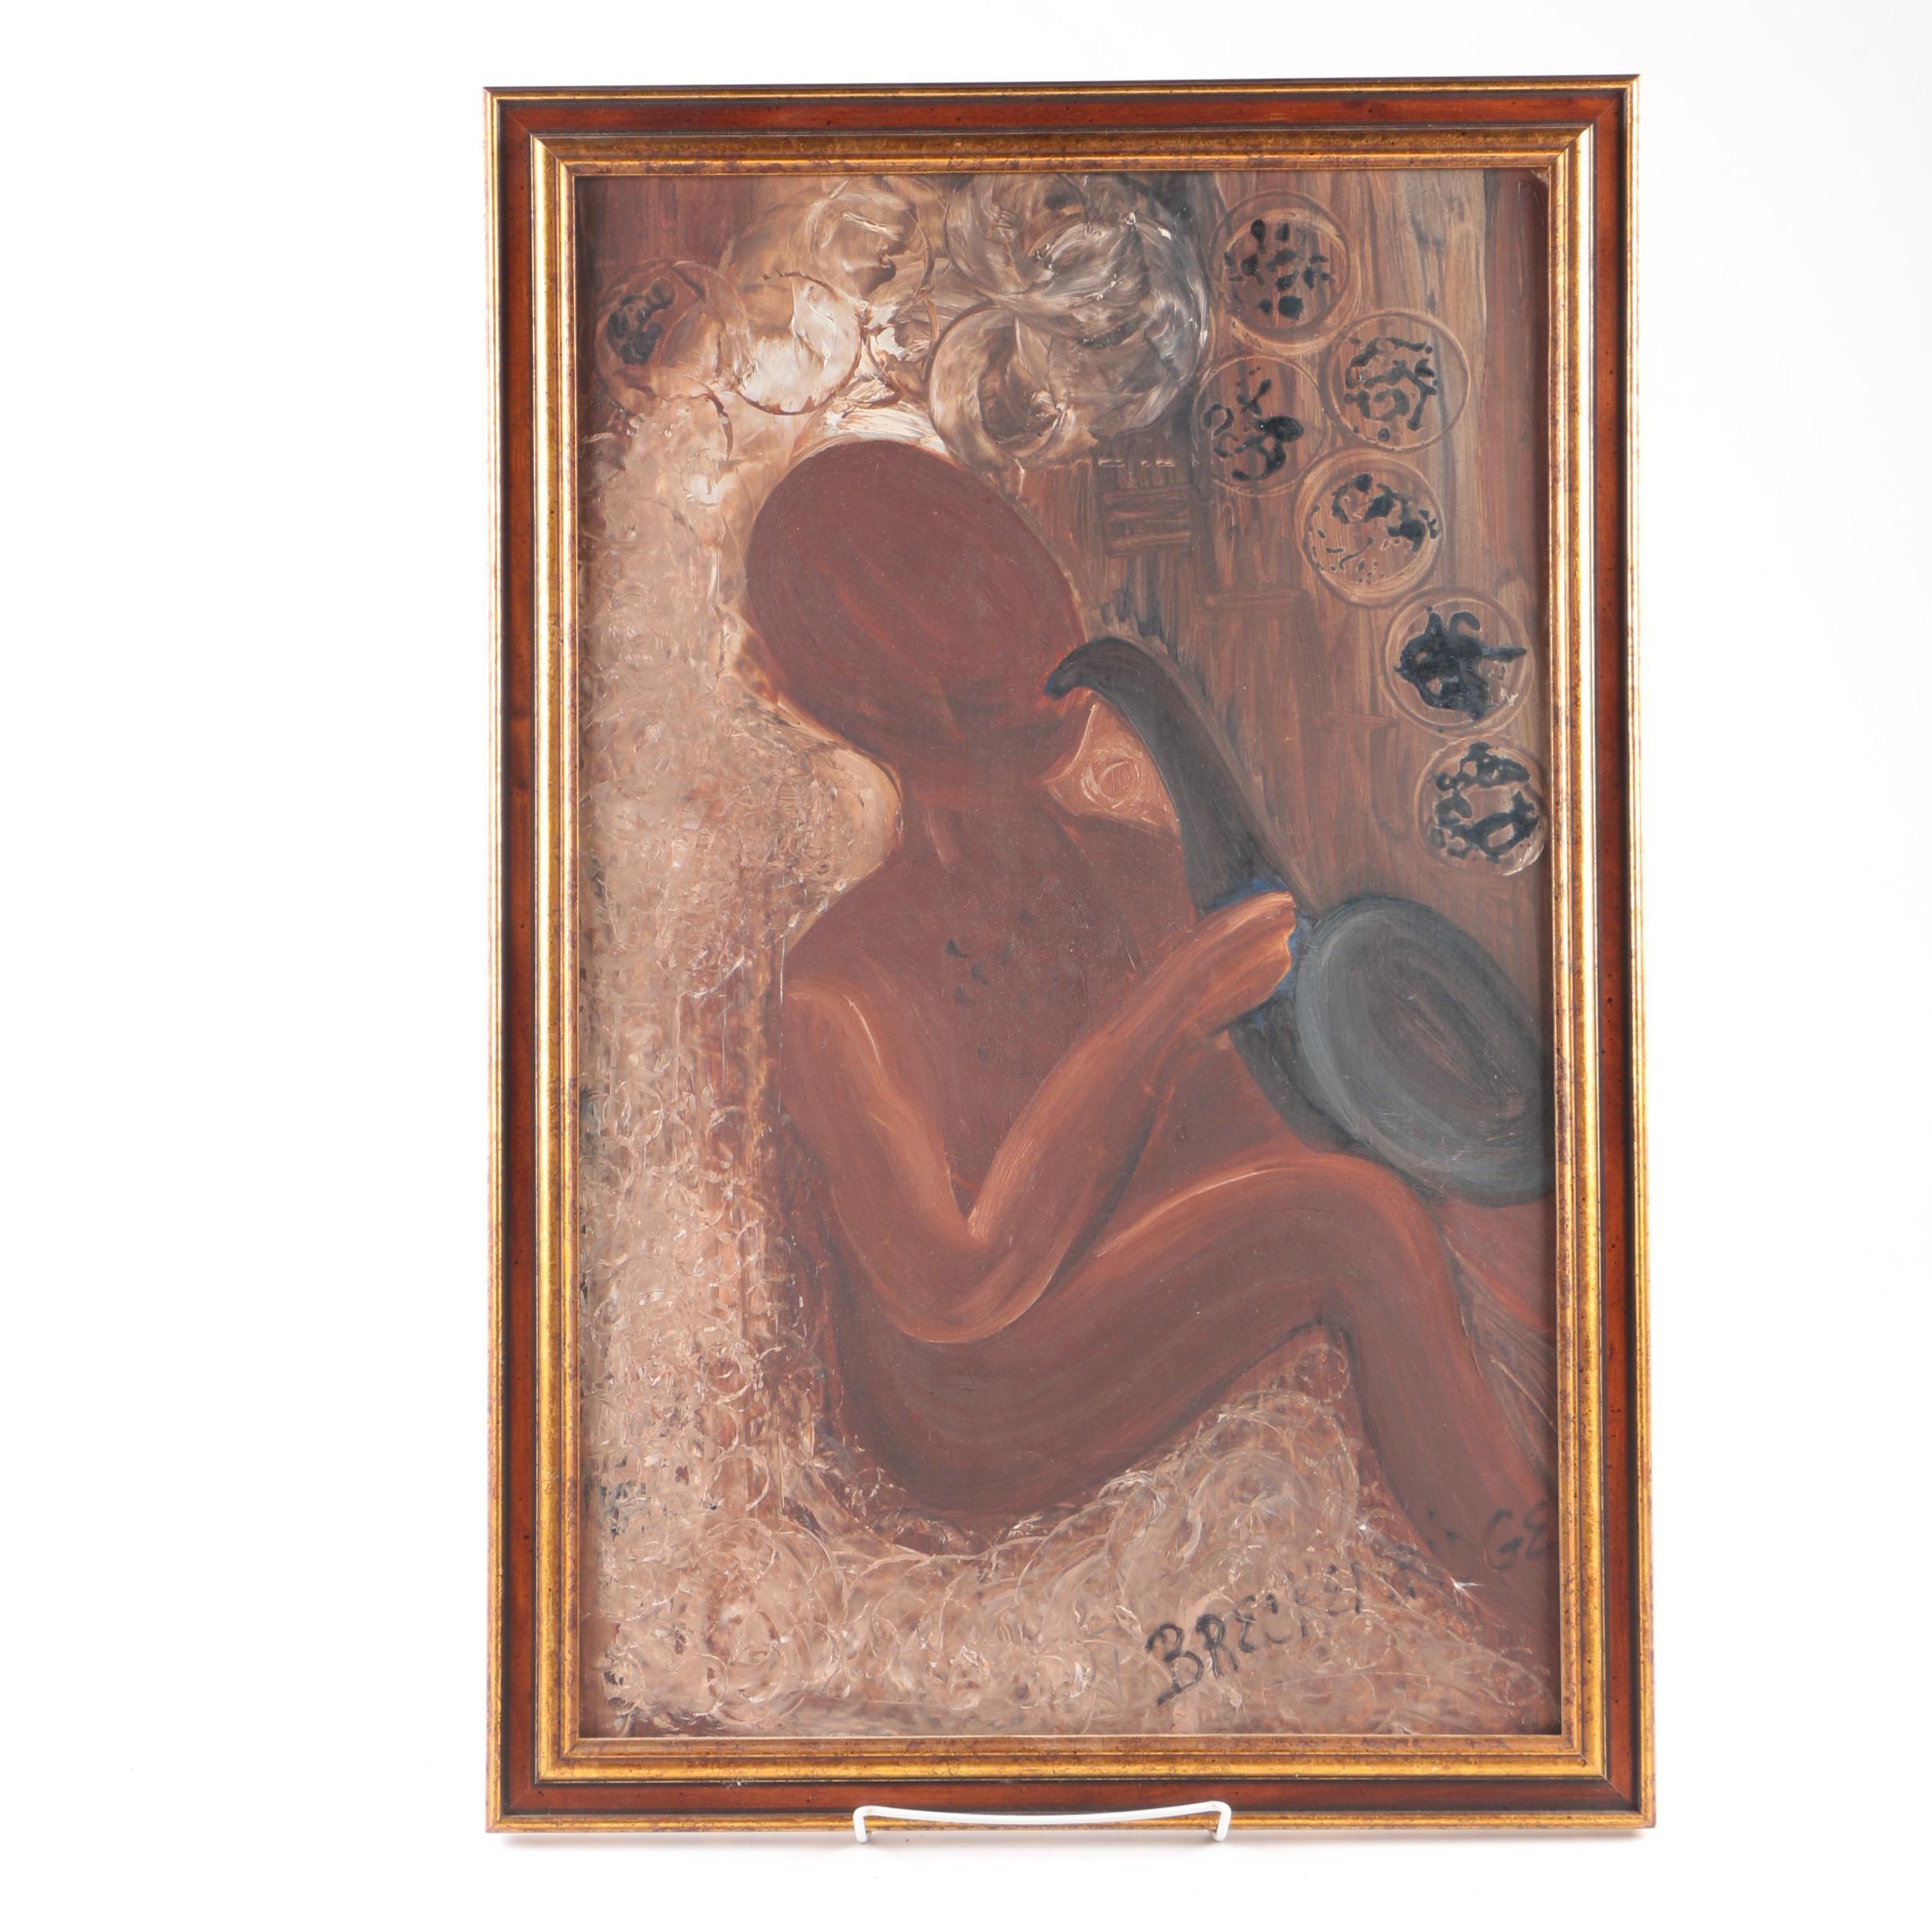 Breckenridge Acrylic Painting on Academy Board of Saxophone Player